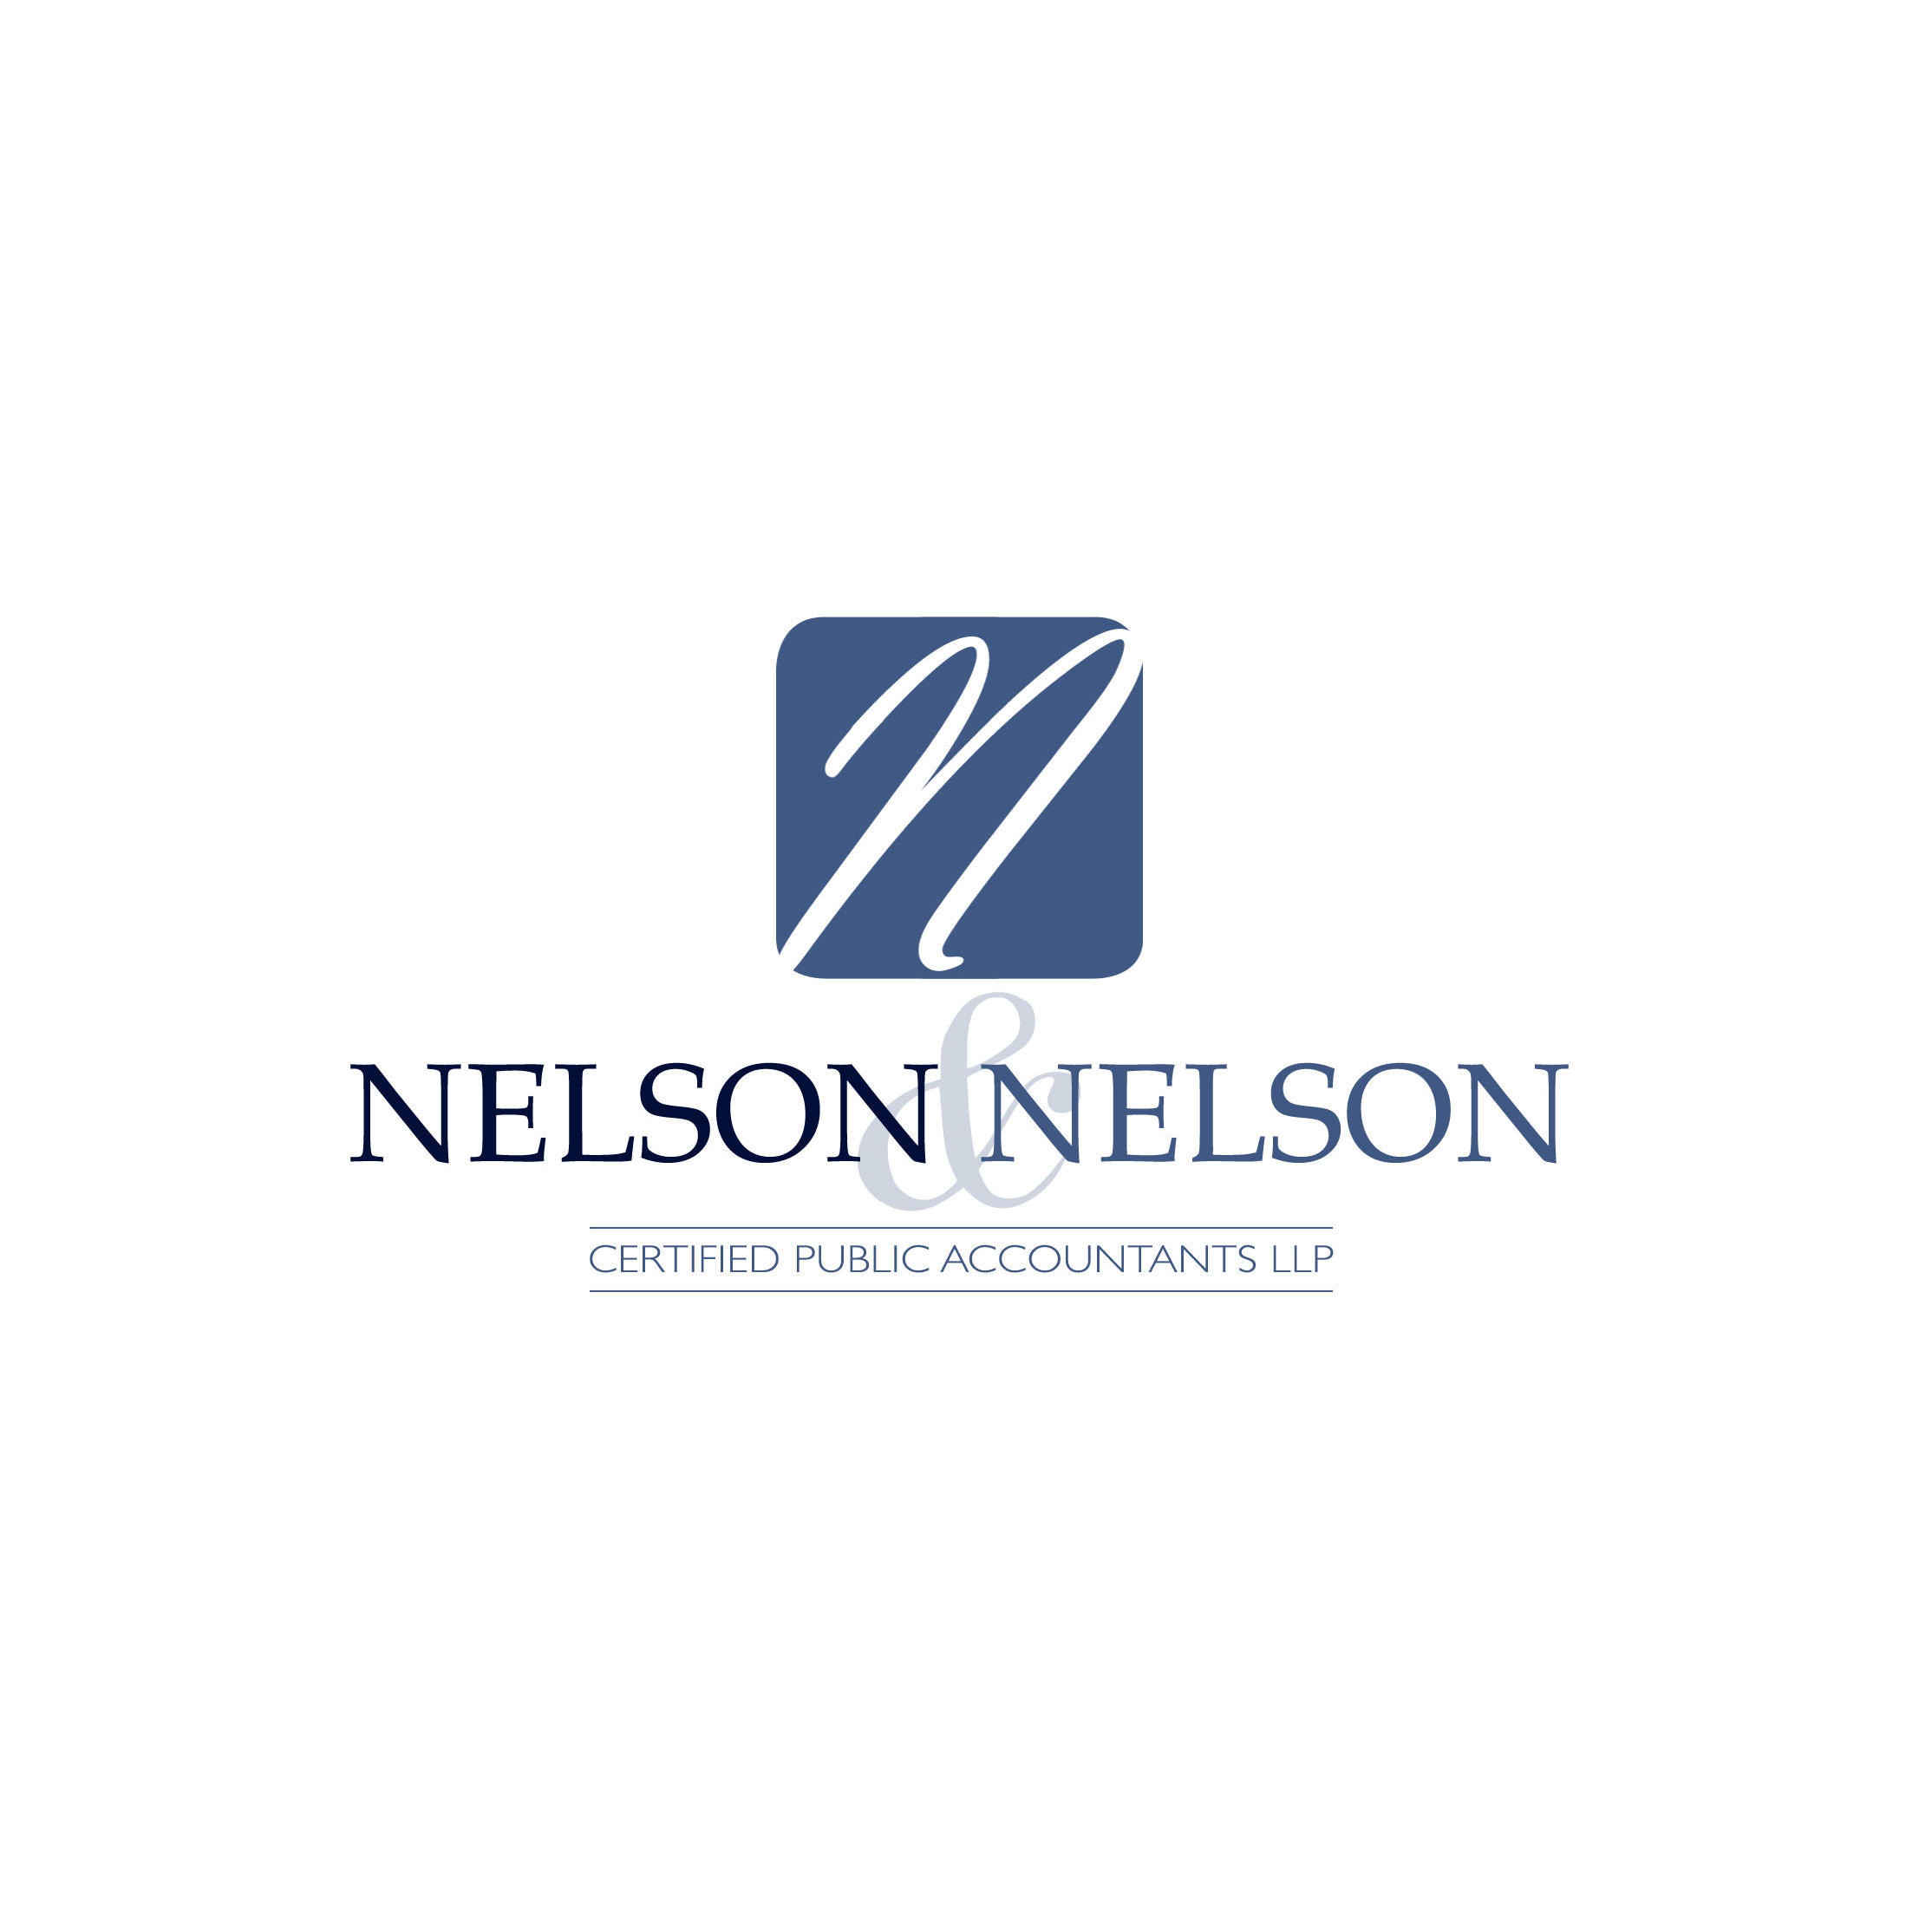 Nelson & Nelson CPAS LLP